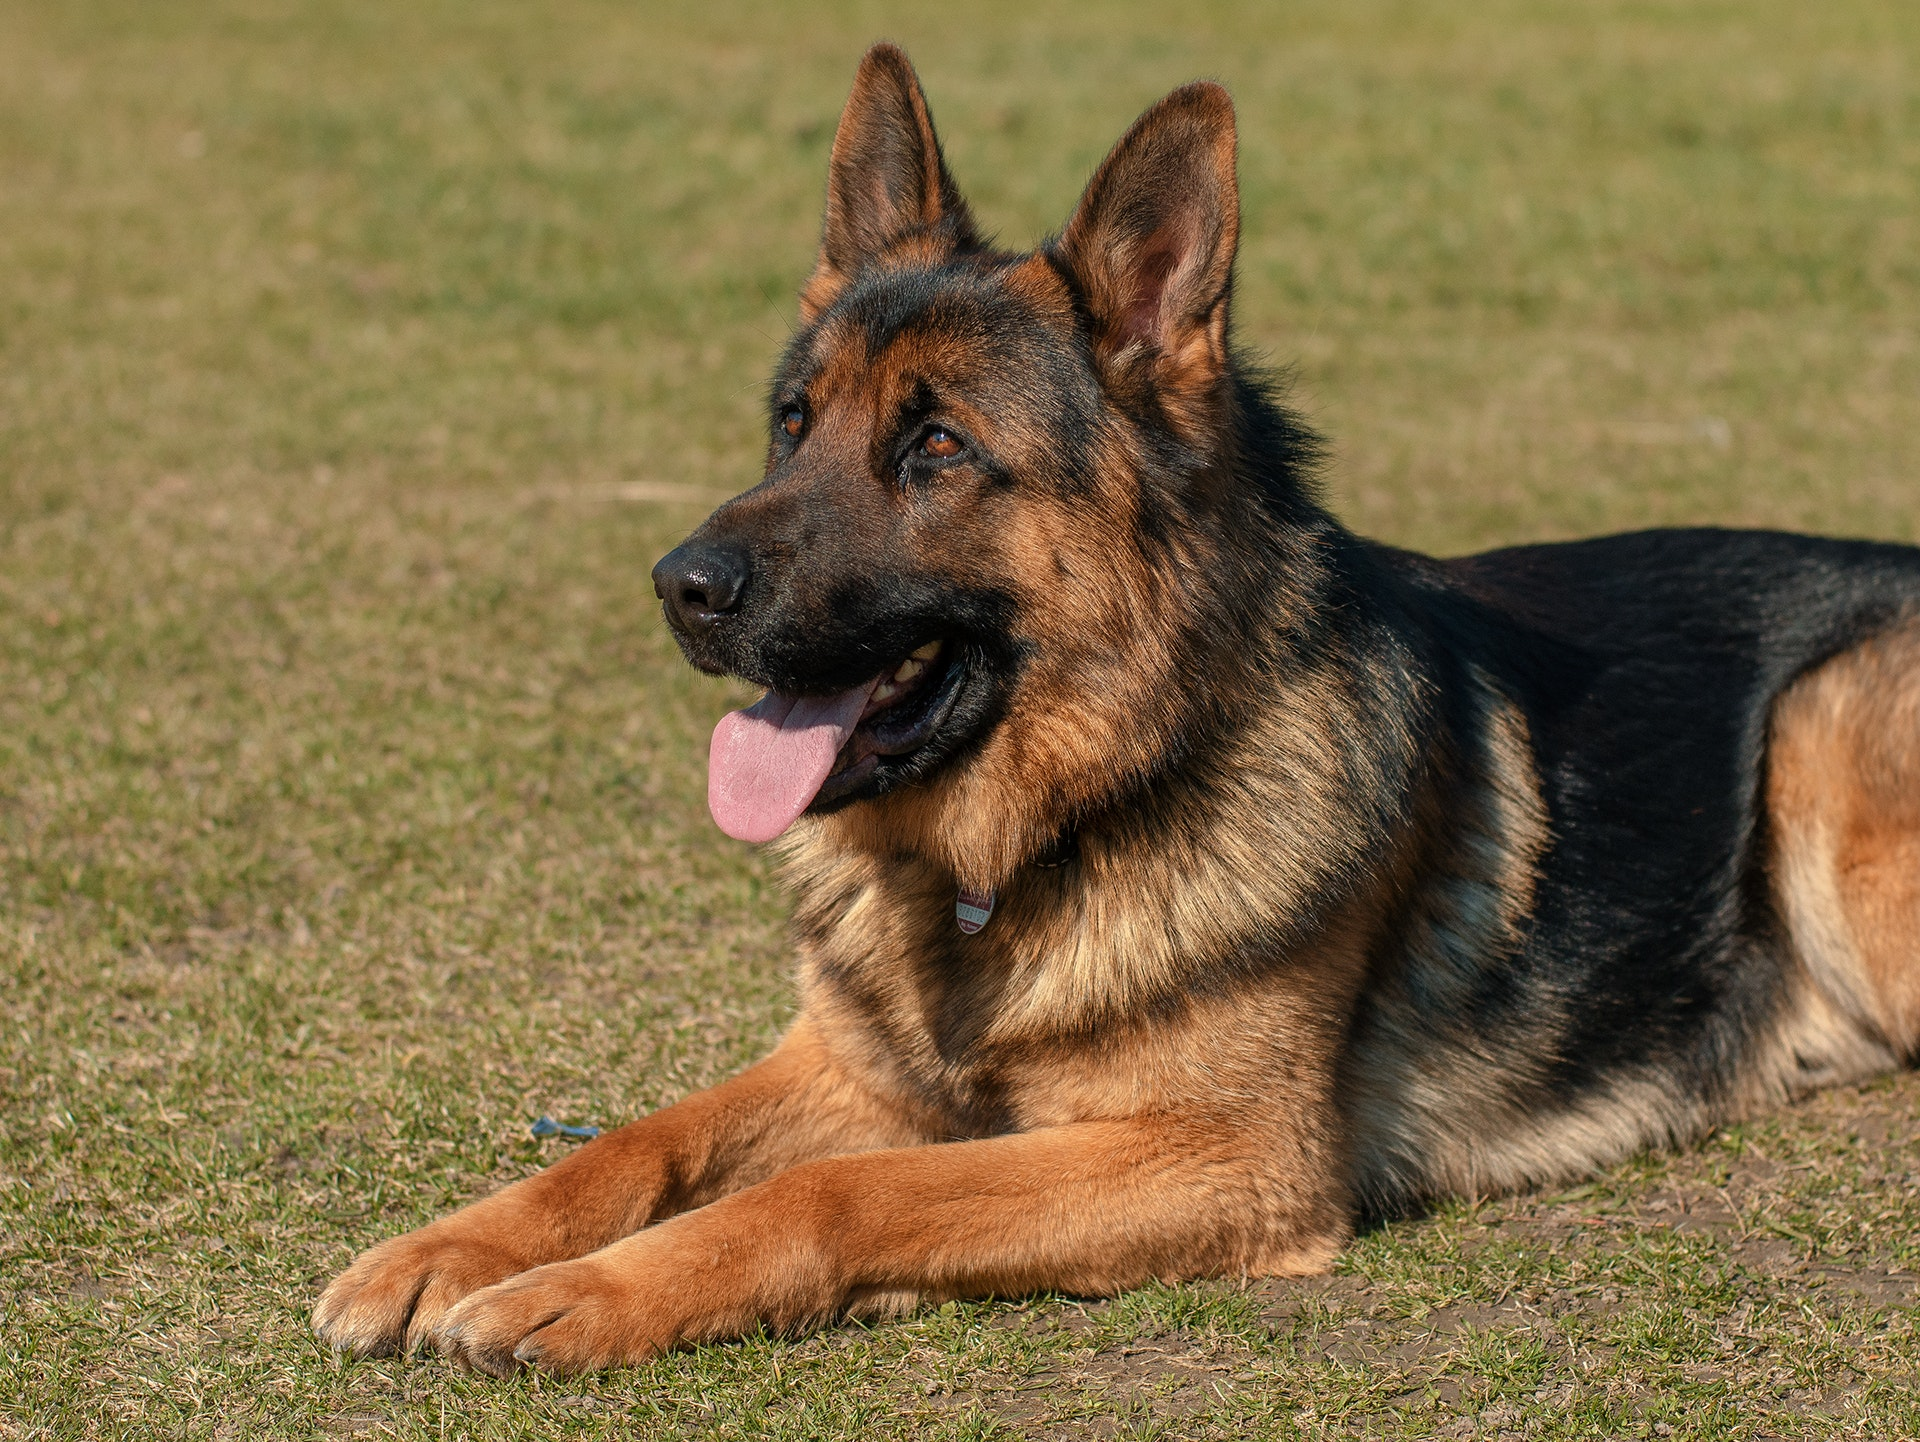 adorable-animal-breed-350428.jpg